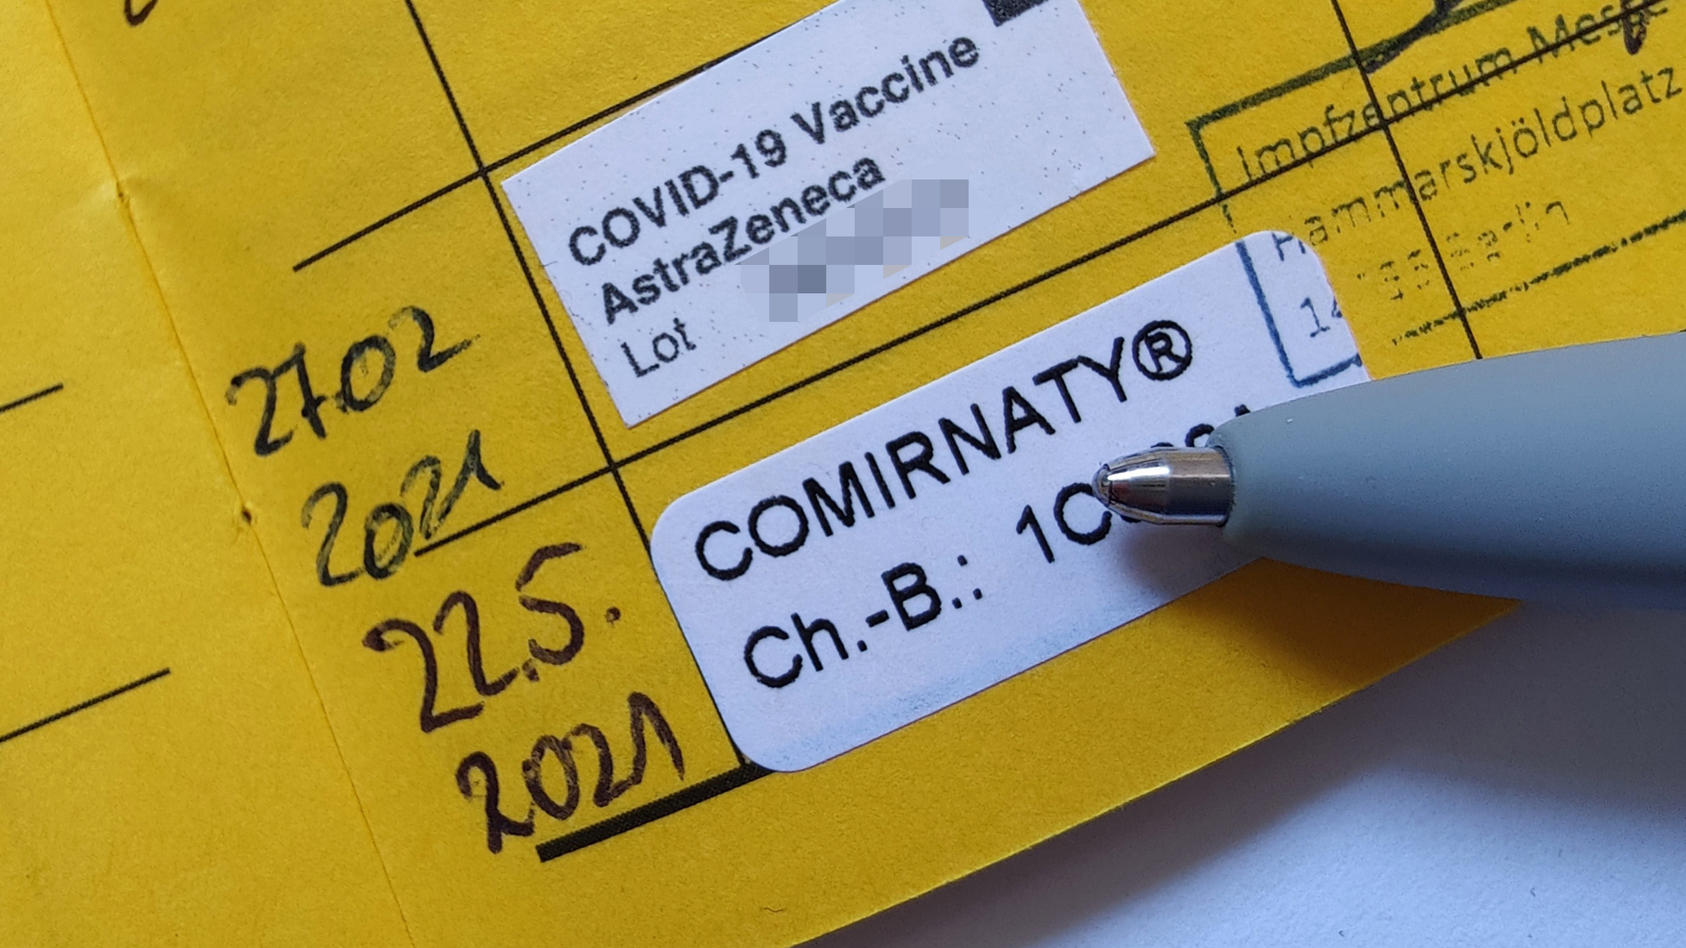 Gemischte Corona-Impfung